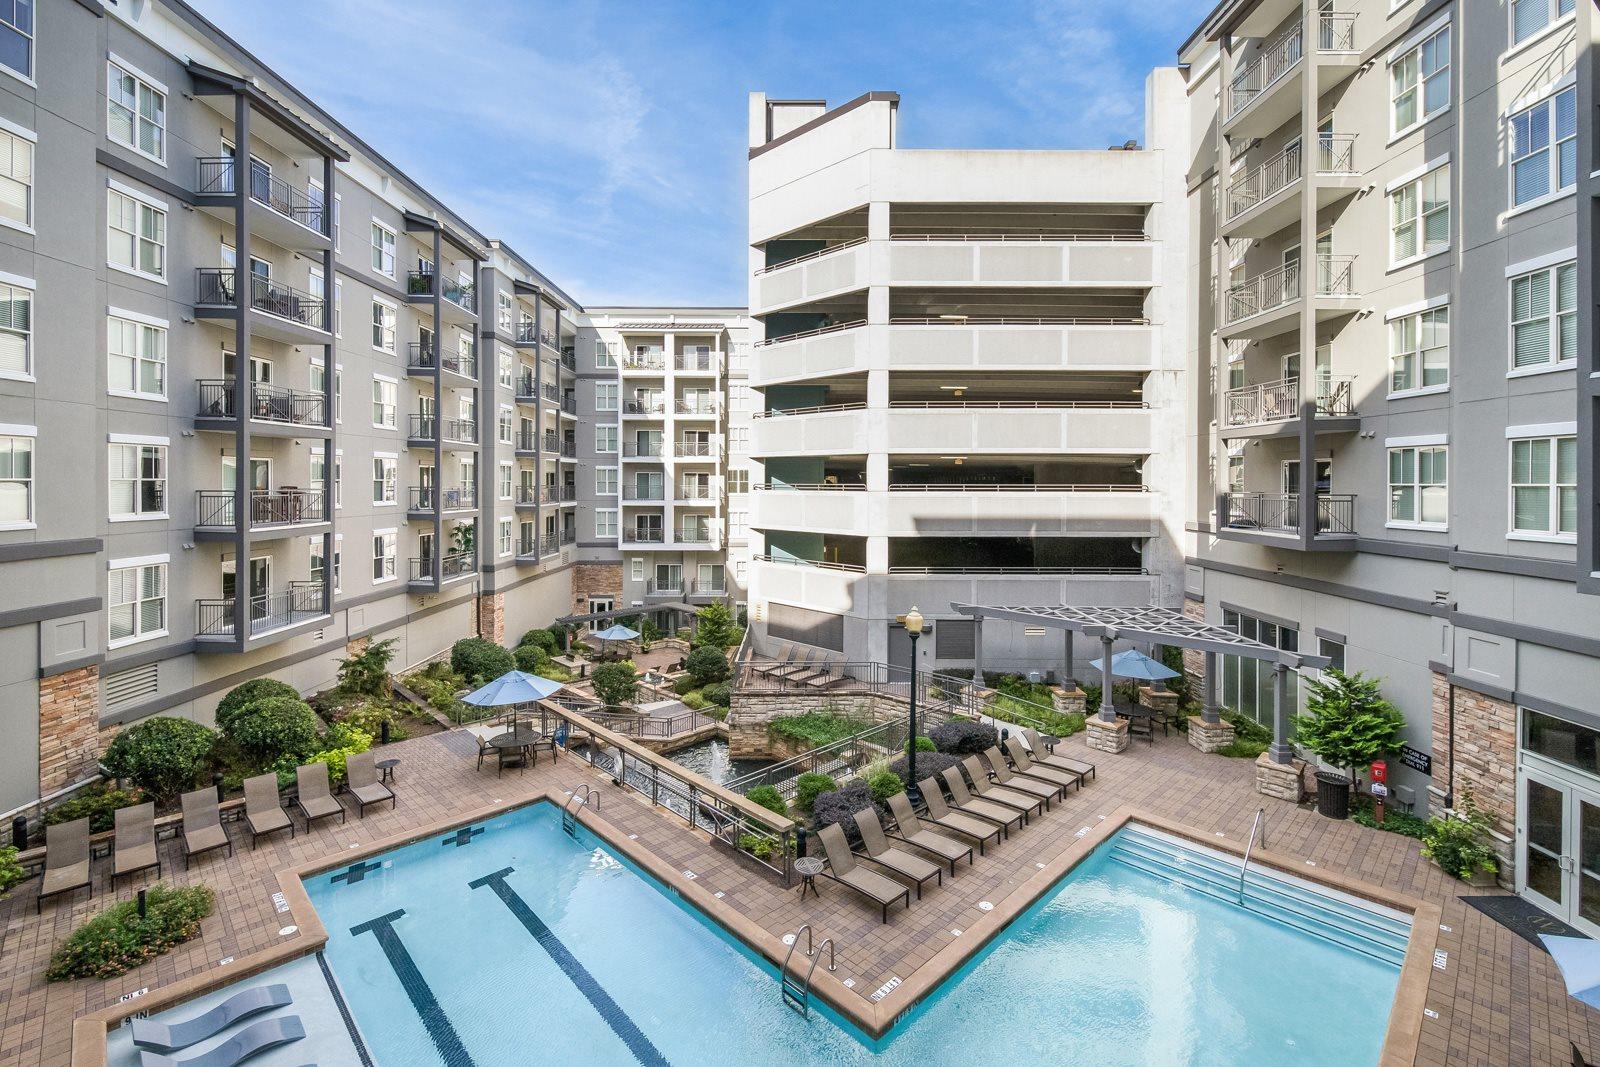 Courtyard with Pools, Fountains, and Waterfalls at Windsor at Brookhaven, Atlanta, GA